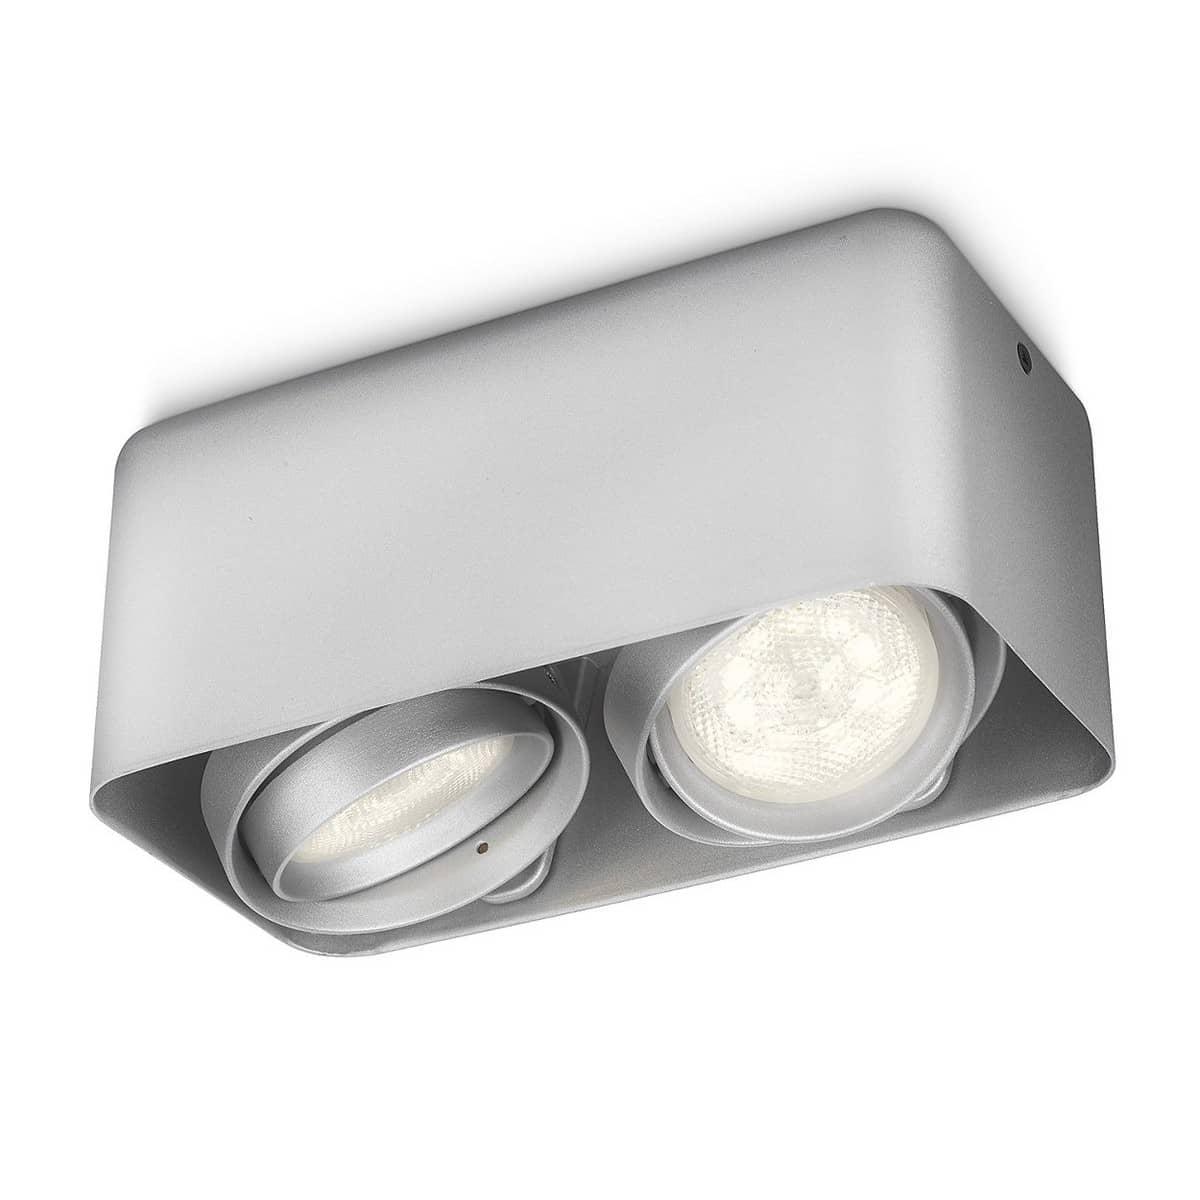 philips led deckenspot afzelia 2x3w 53202 48 16. Black Bedroom Furniture Sets. Home Design Ideas